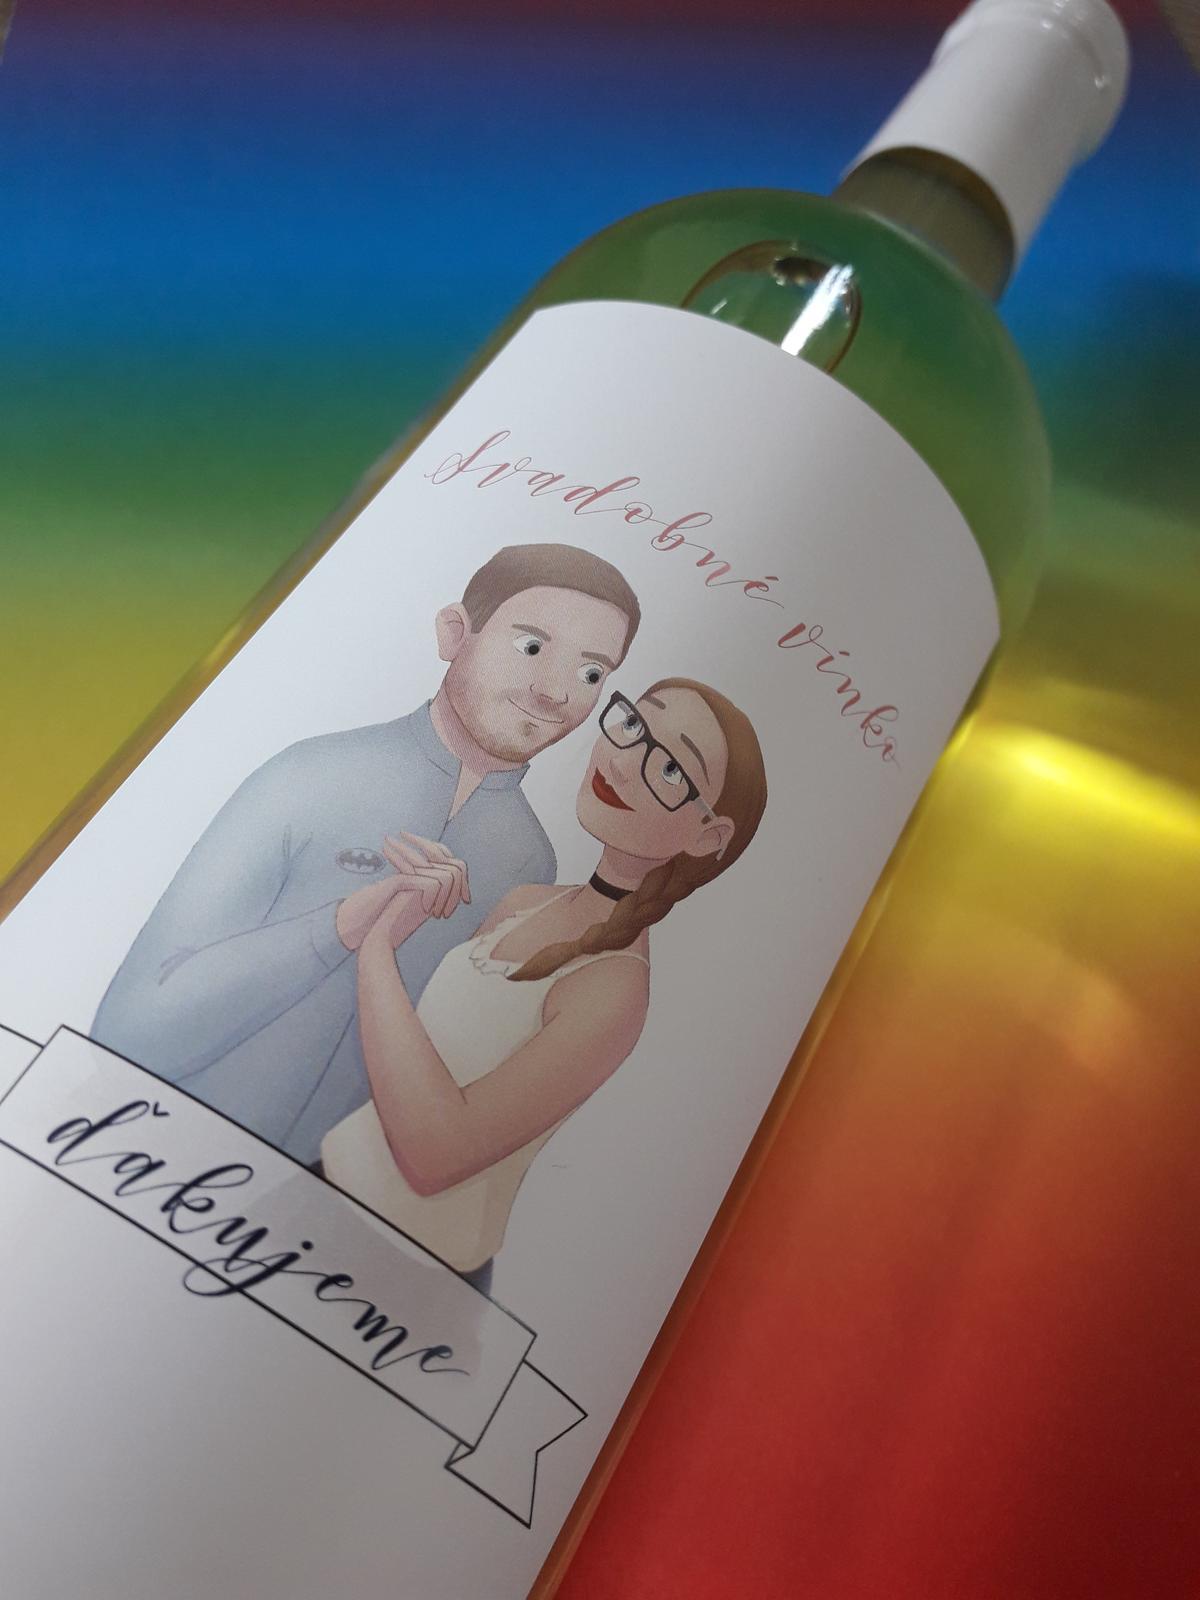 vinomaravilla - Svadobné výslužky s vlastnou etiketou. Výroba nevesty.. tlieskame :)